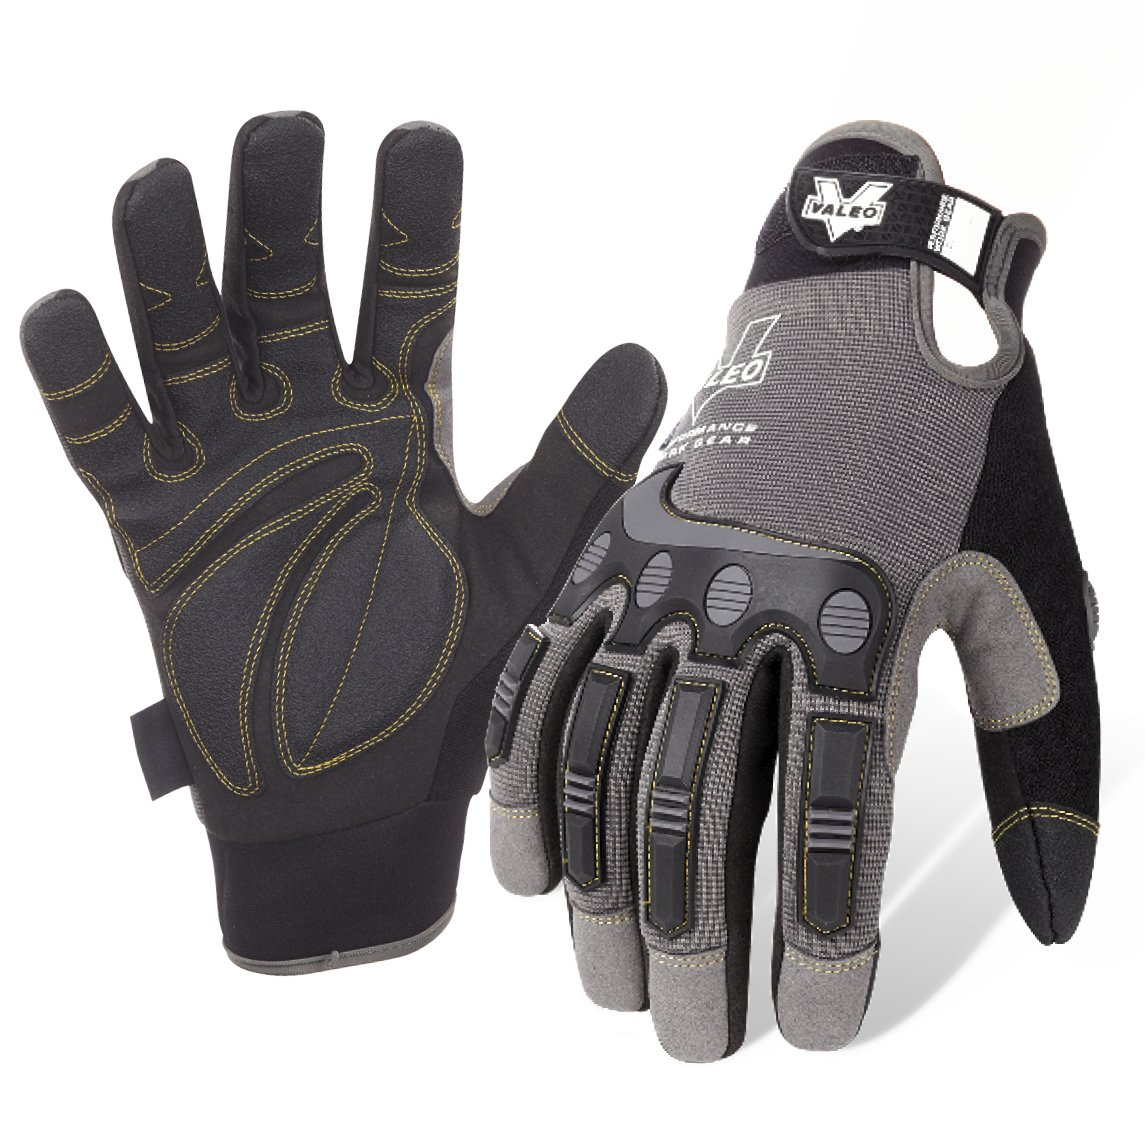 Valeo Industrial V412 Mechanics Impact and Anti-Vibe Pro Gloves, VI9548, Pair, Grey, XL